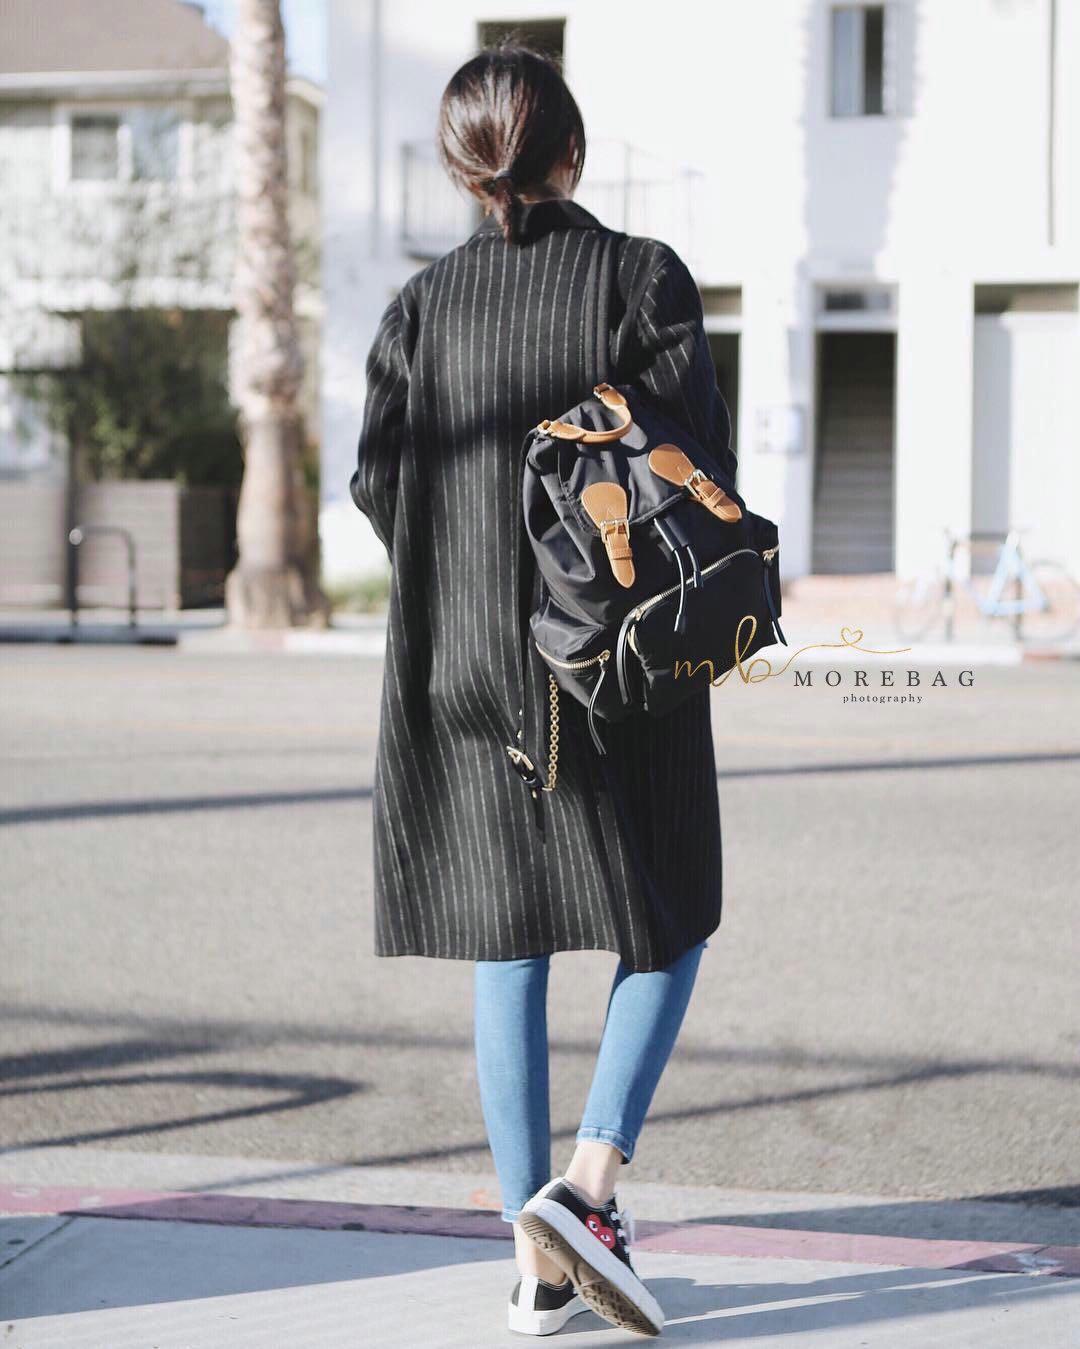 Black drawstring back pack - Burberry backpack lookalike